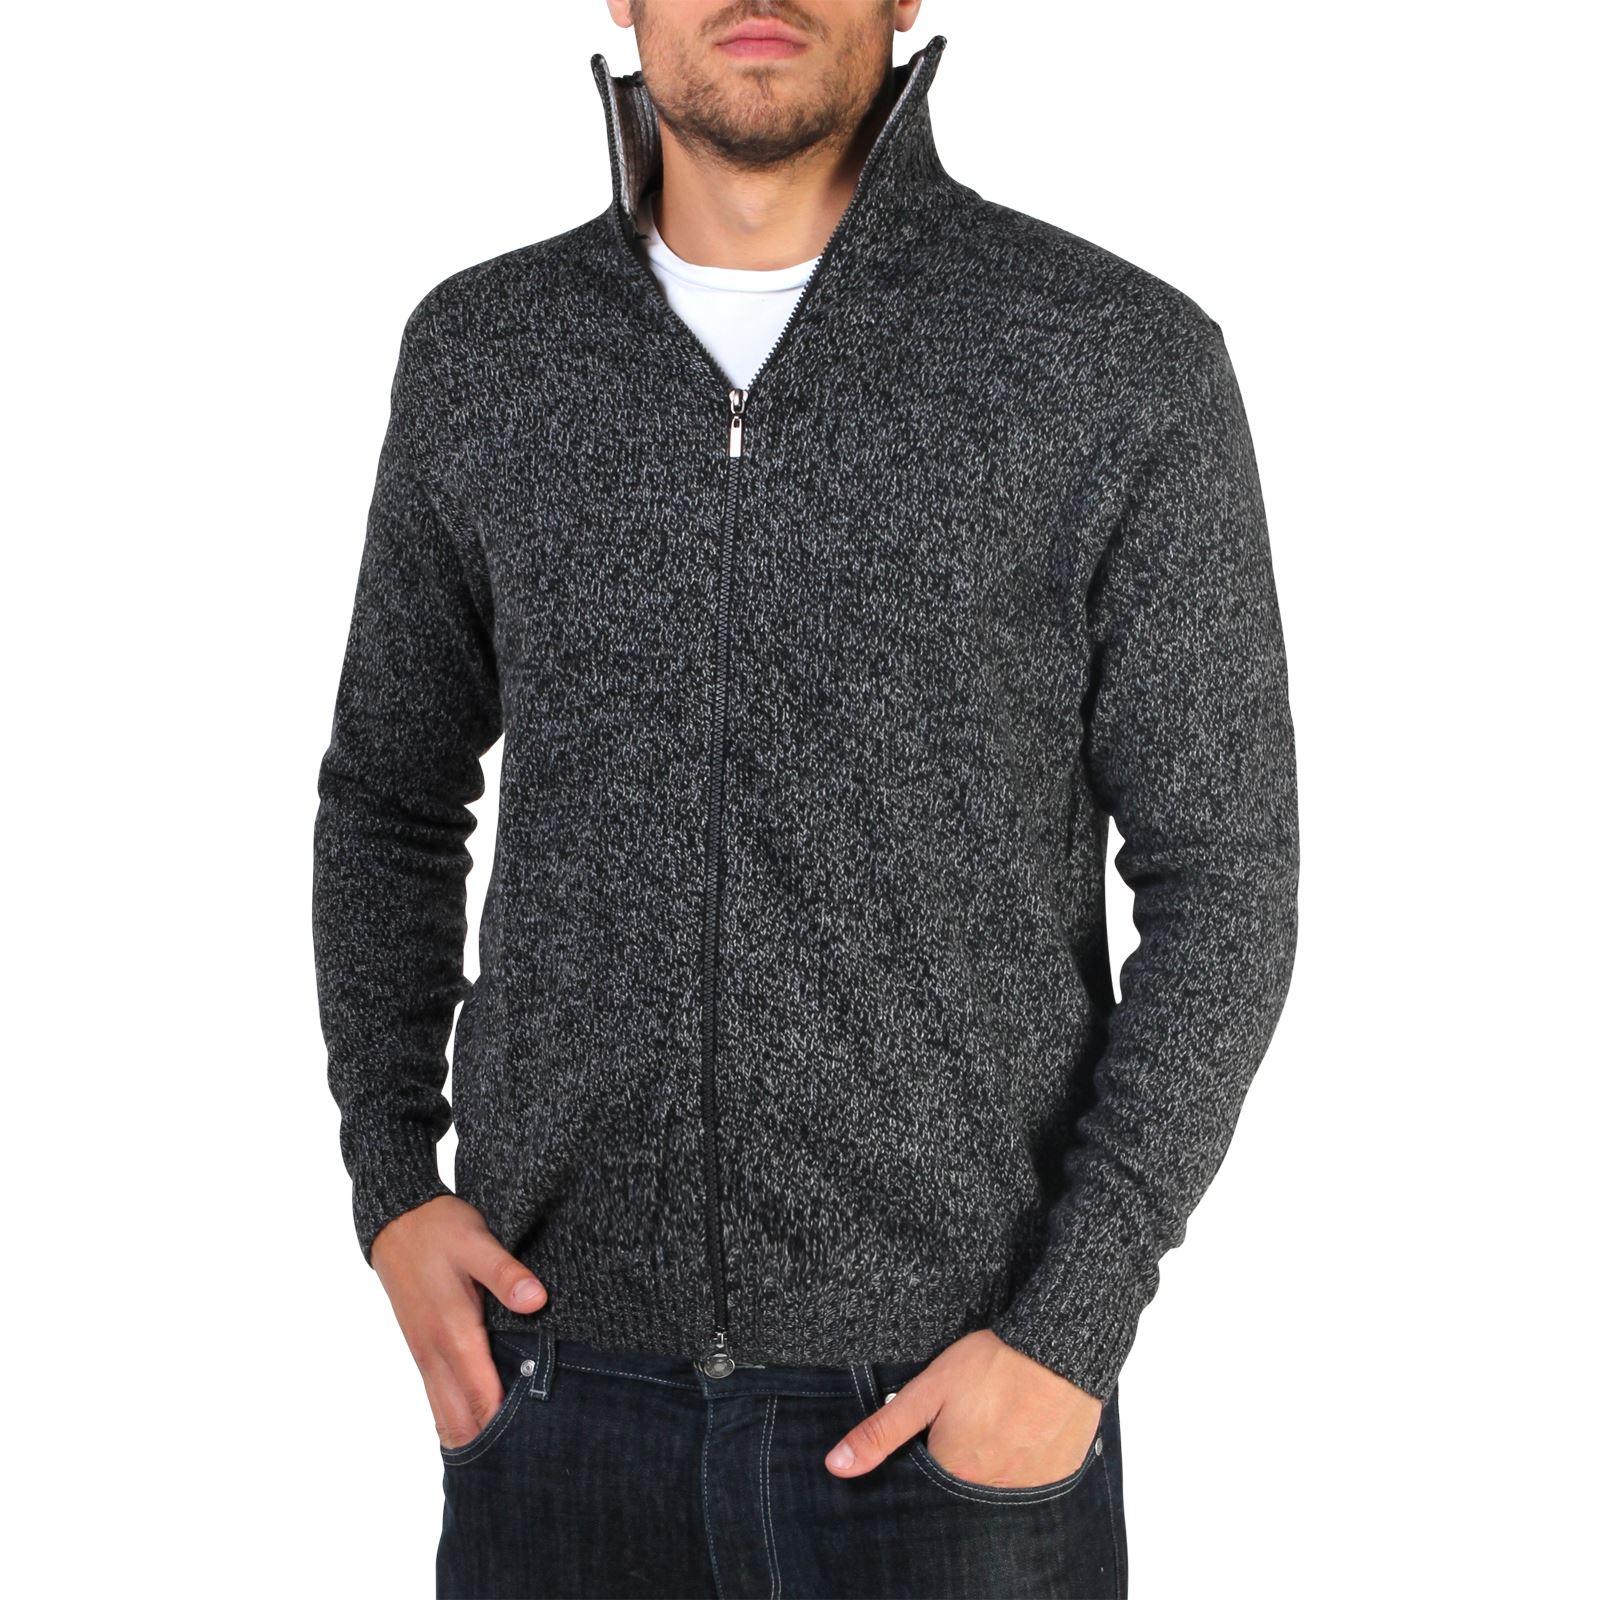 Mens-Wool-Jumper-Winter-Sweater-Zip-Up-Funnel-Neck-Soft-Knit-Cardigan-Top thumbnail 4